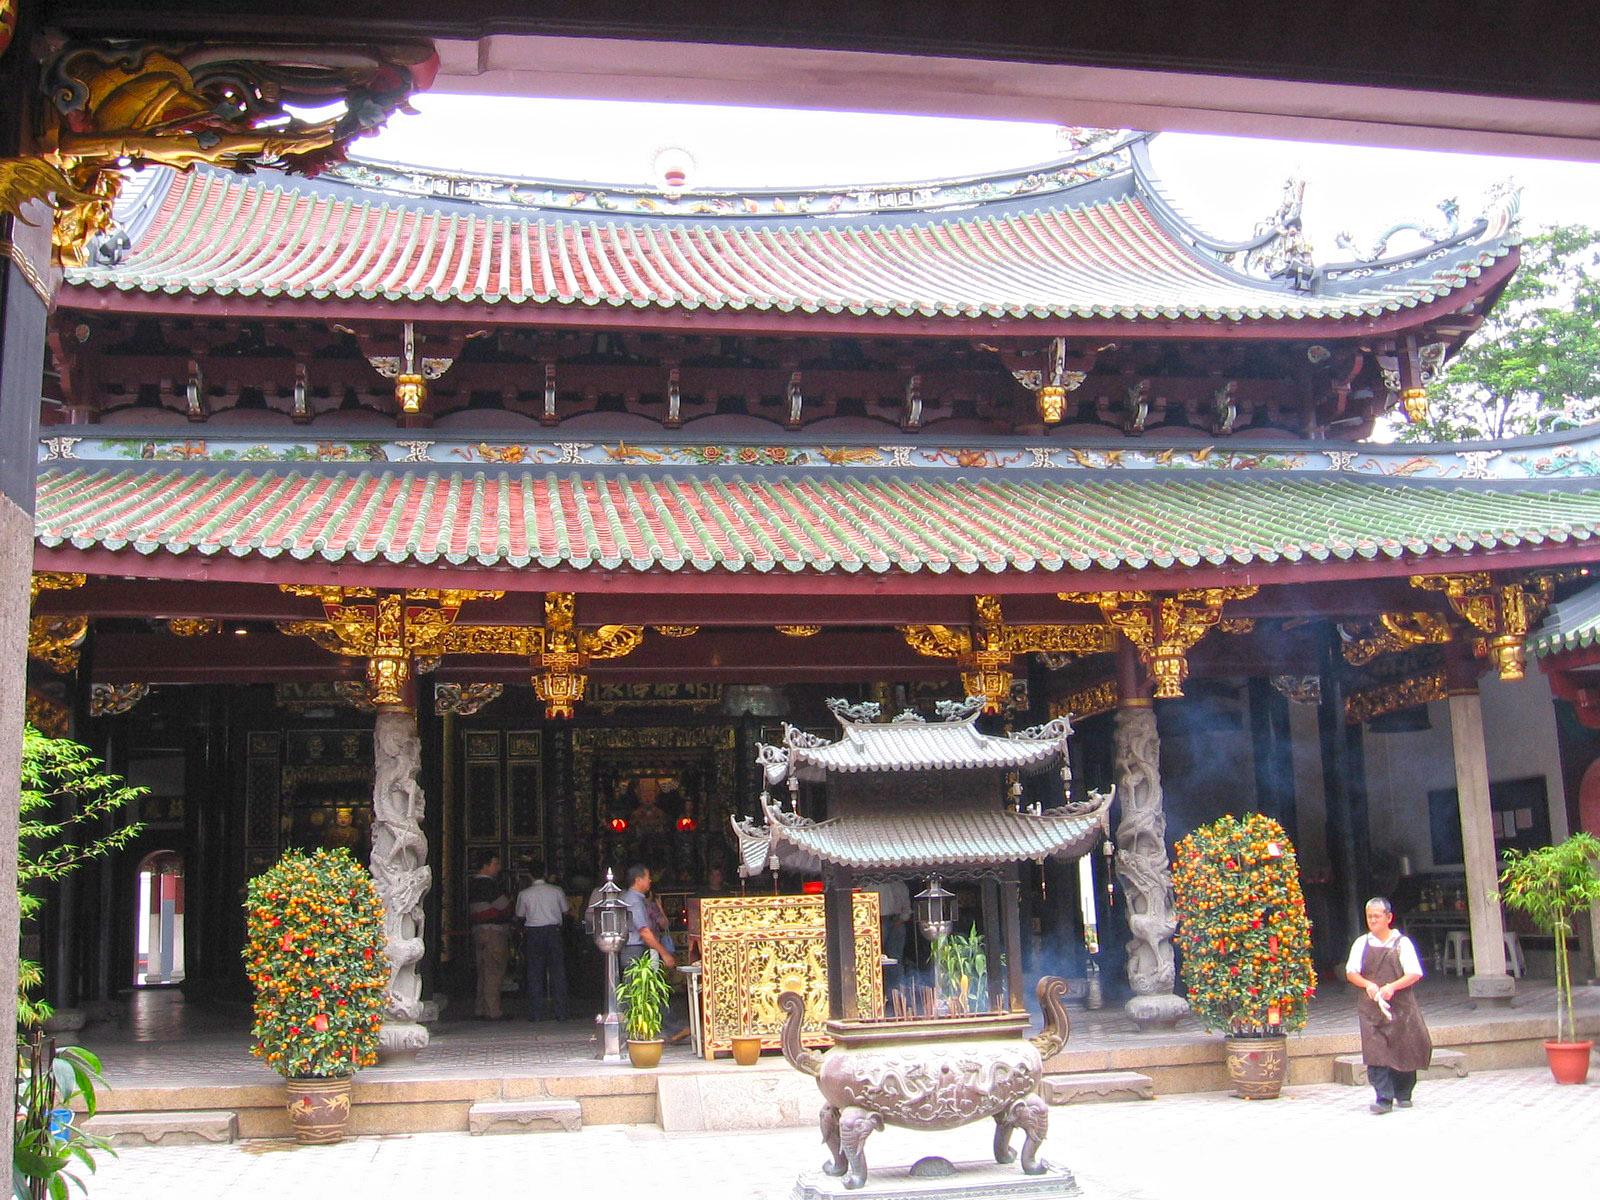 Tempelaufenthalt in Korea